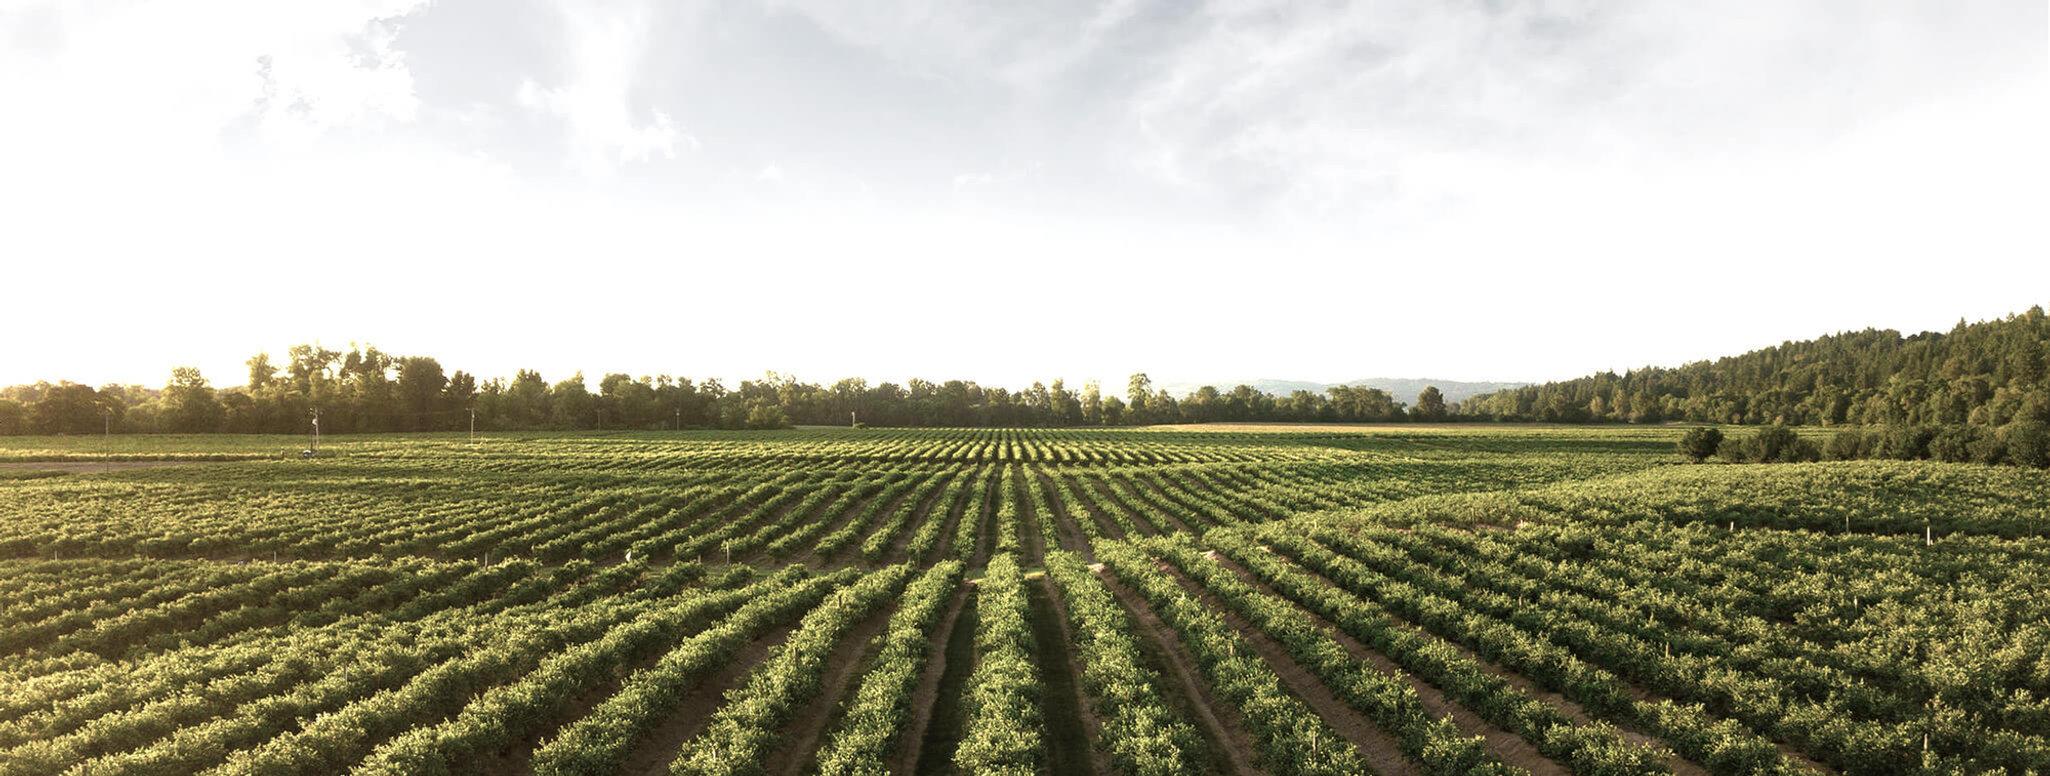 The Original Resveratrol 白藜芦醇|法国|朗格多克鲁西永|葡萄|黑比诺葡萄|葡萄园|